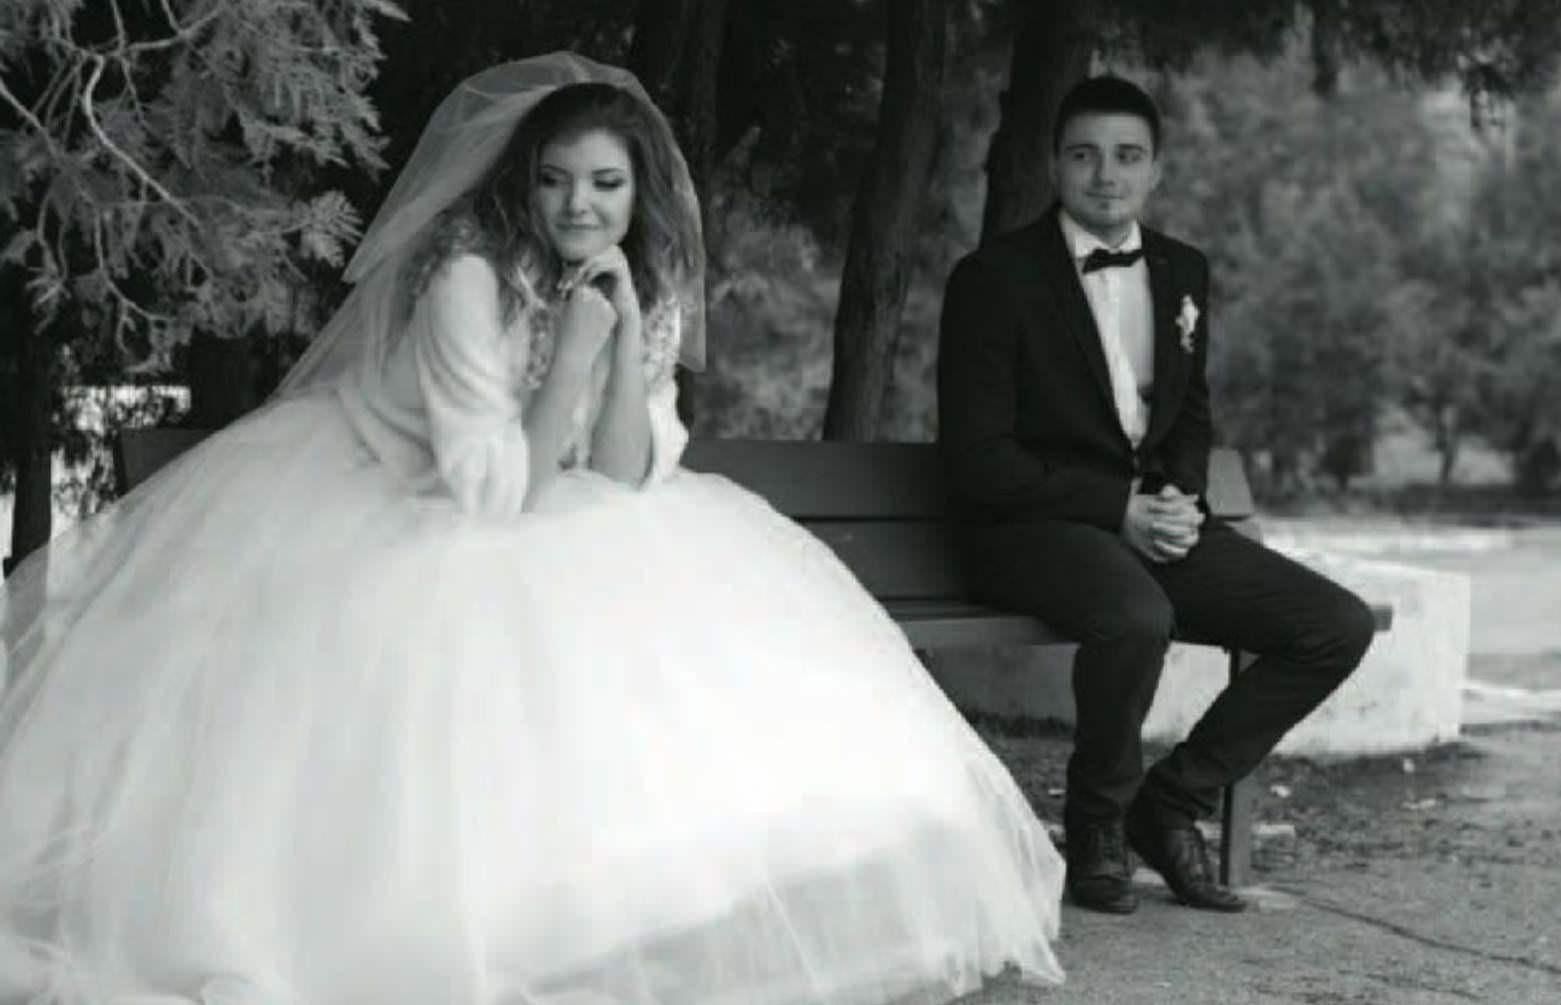 Idea can asian wedding video editing jobs sorry